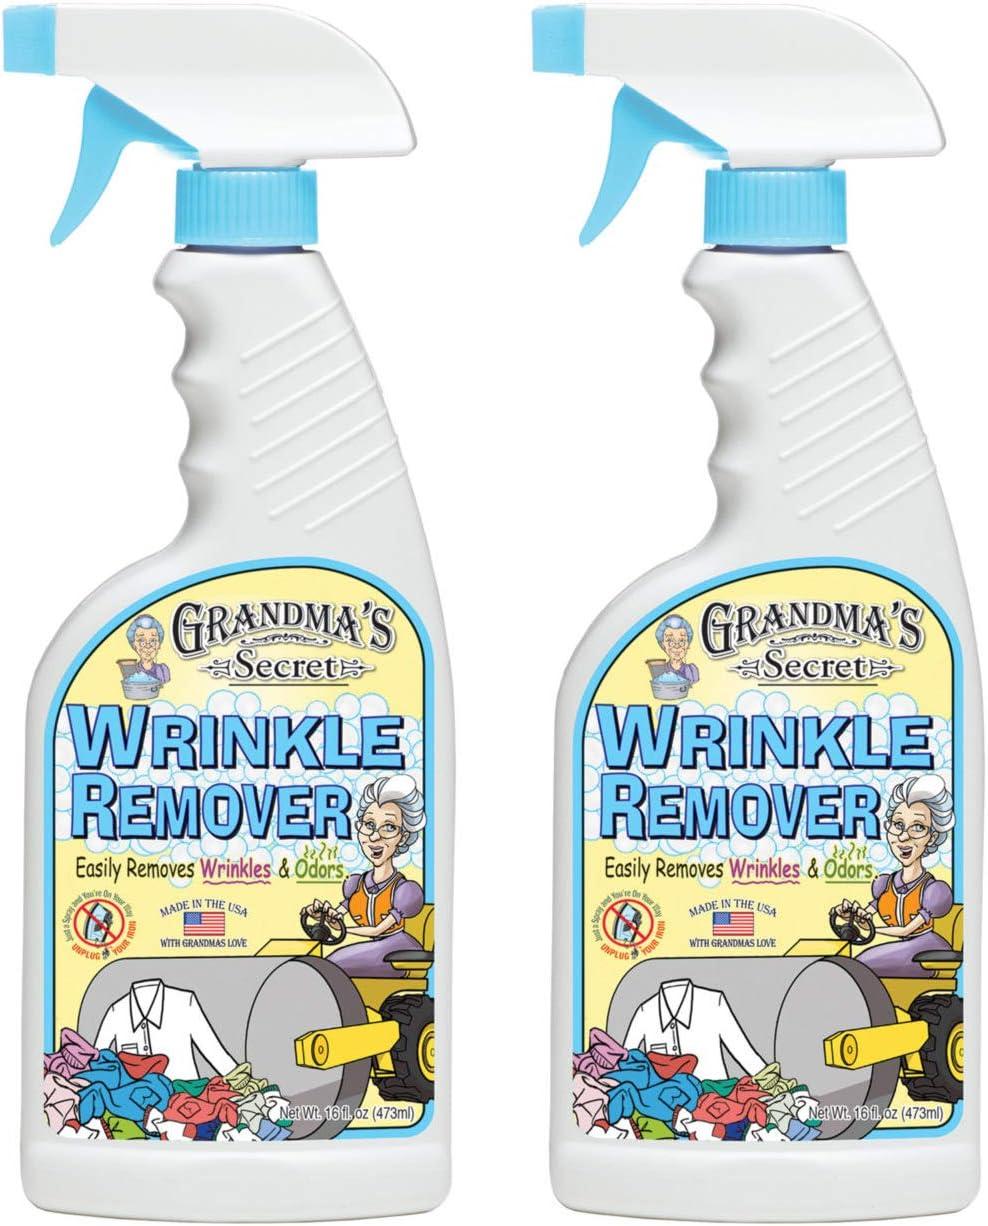 GRANDMA'S Secret wr Wrinkle Remover Spray, 16 oz-2 Pack